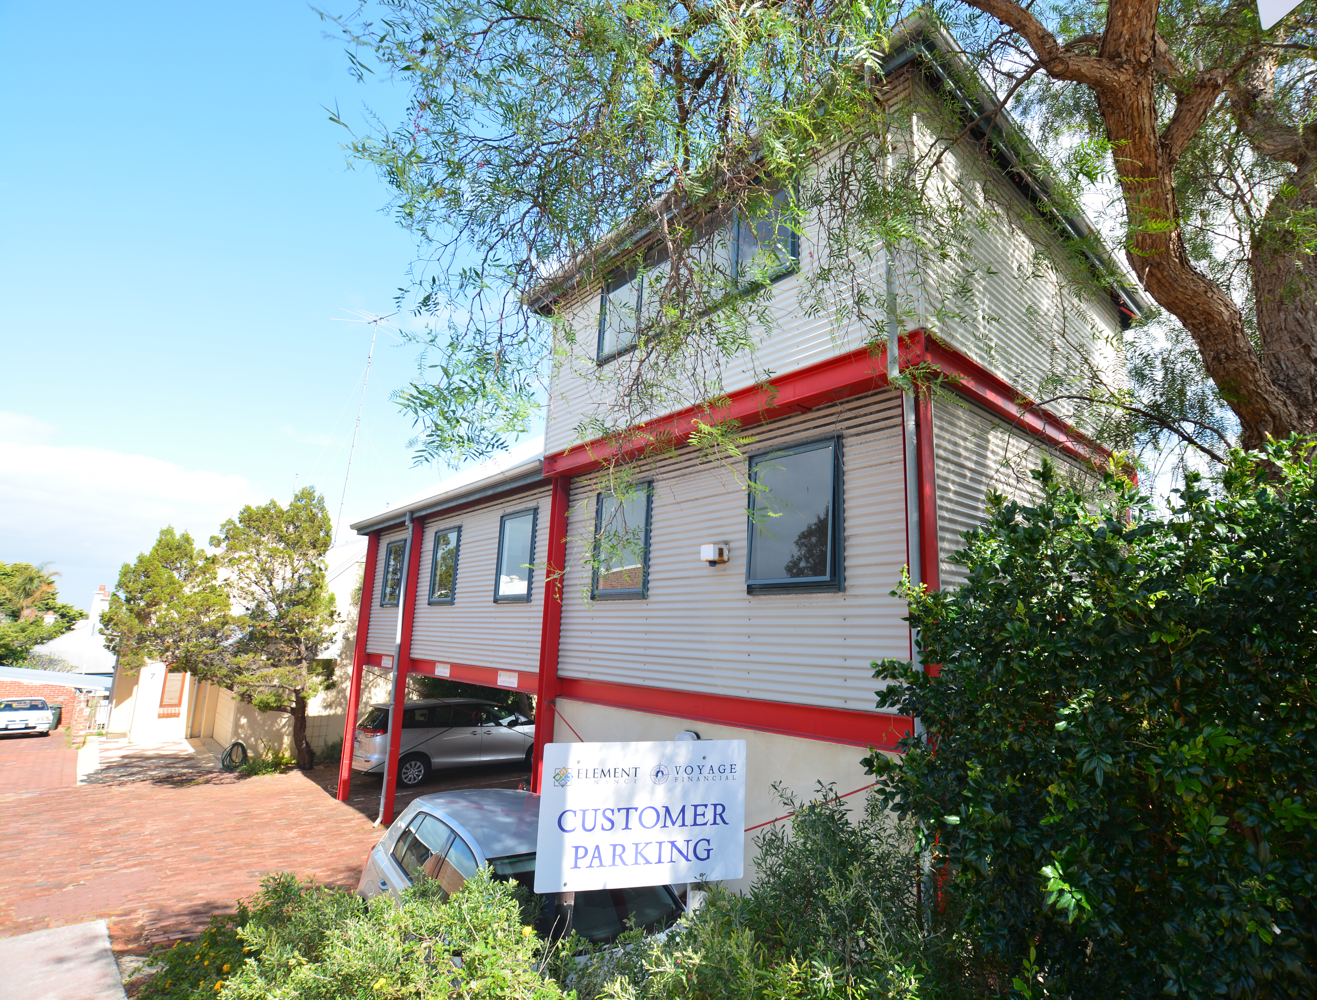 1997 City of Fremantle Heritage Award  Commendationfremantle migrant resource centre -